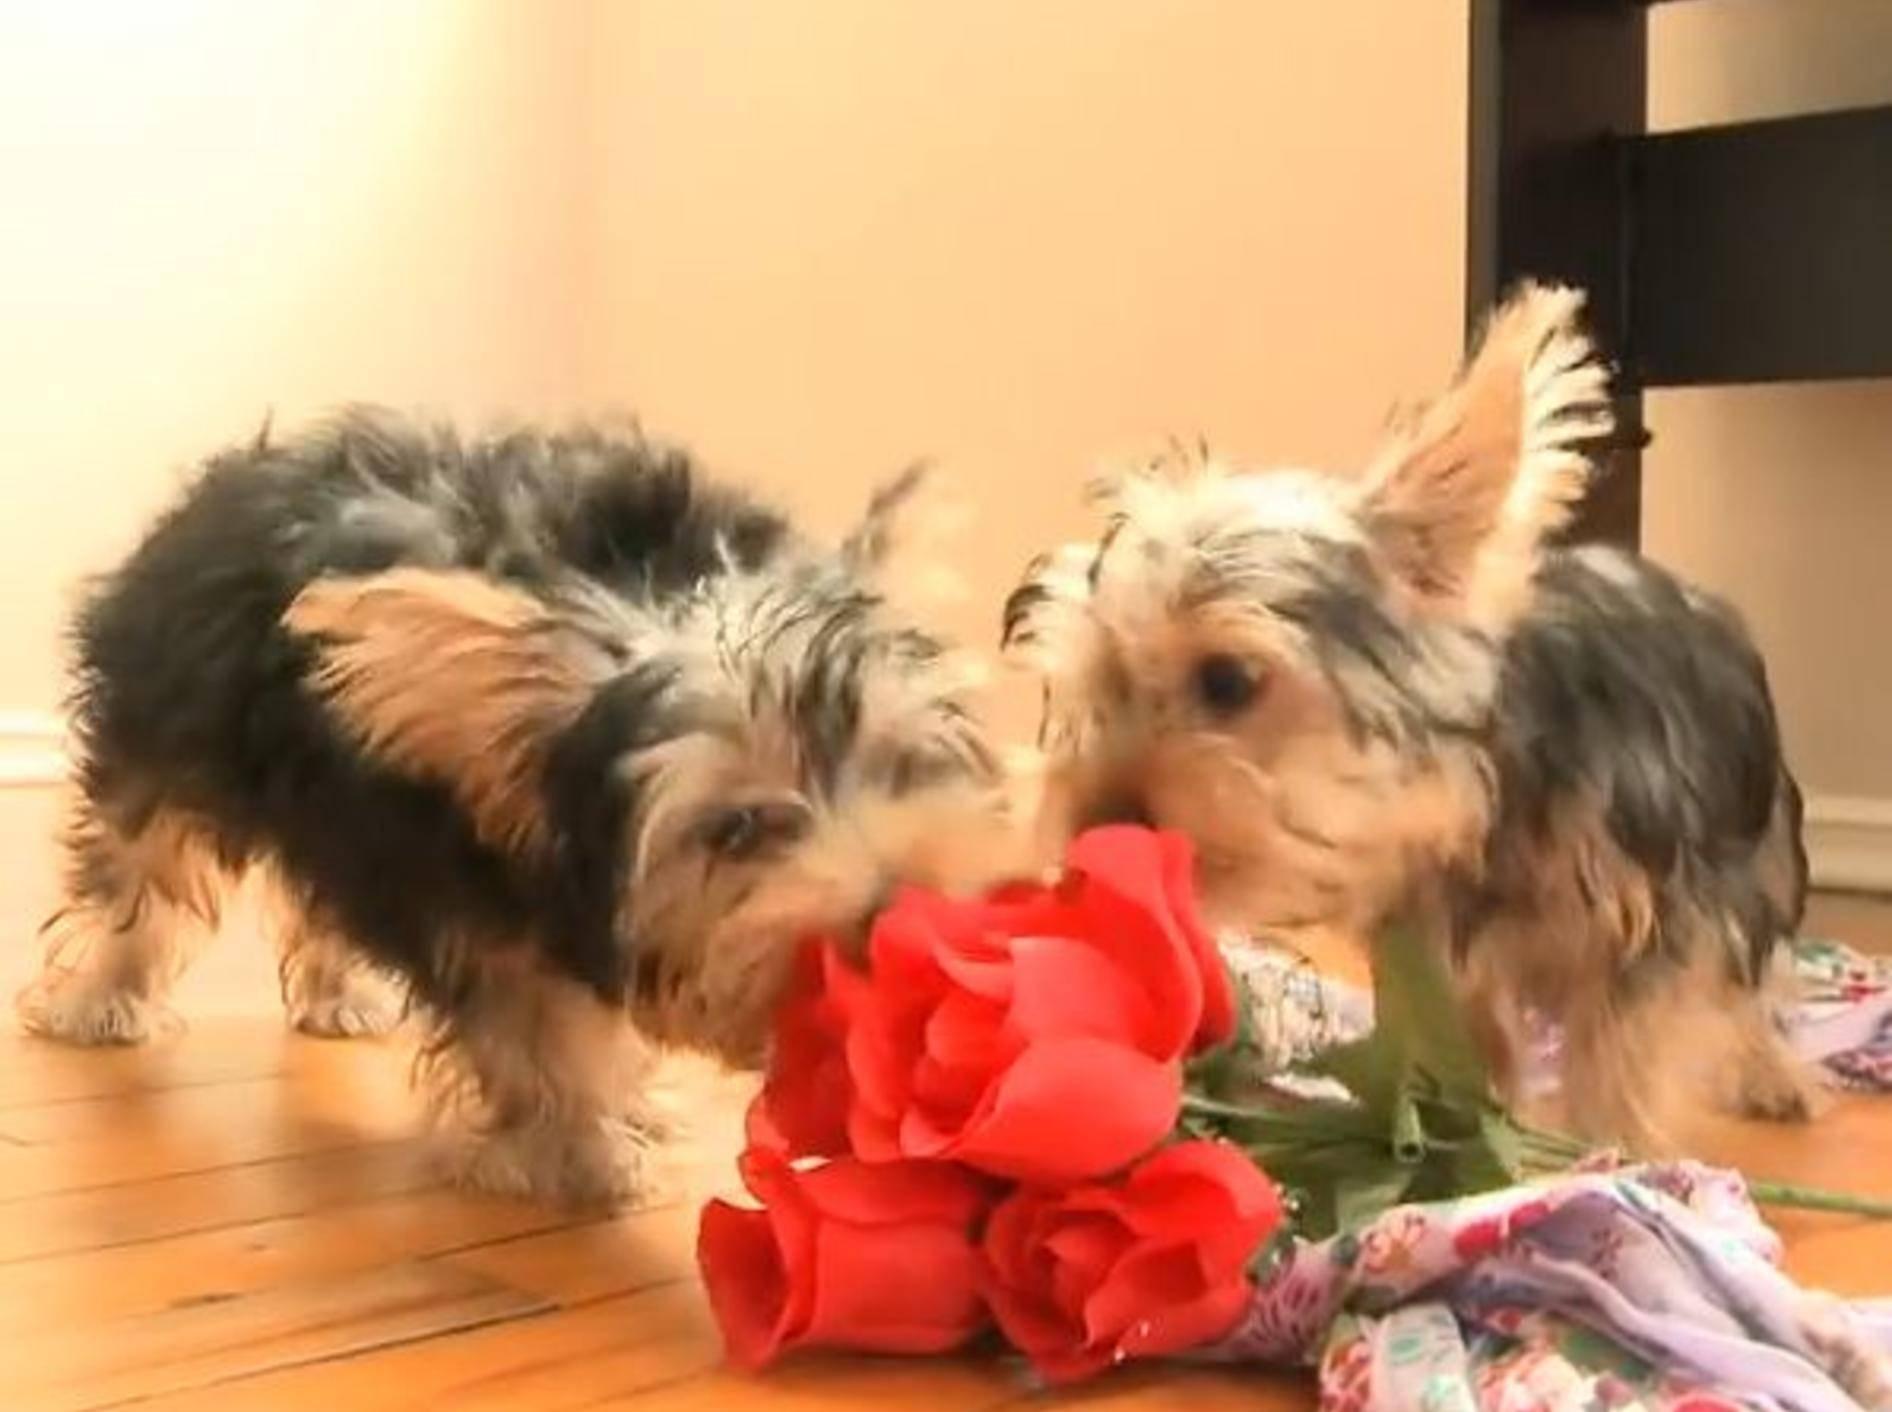 Yorkshire Terrier-Welpen spielen mit Rosen – Bild: YouTube / The Pet Collective